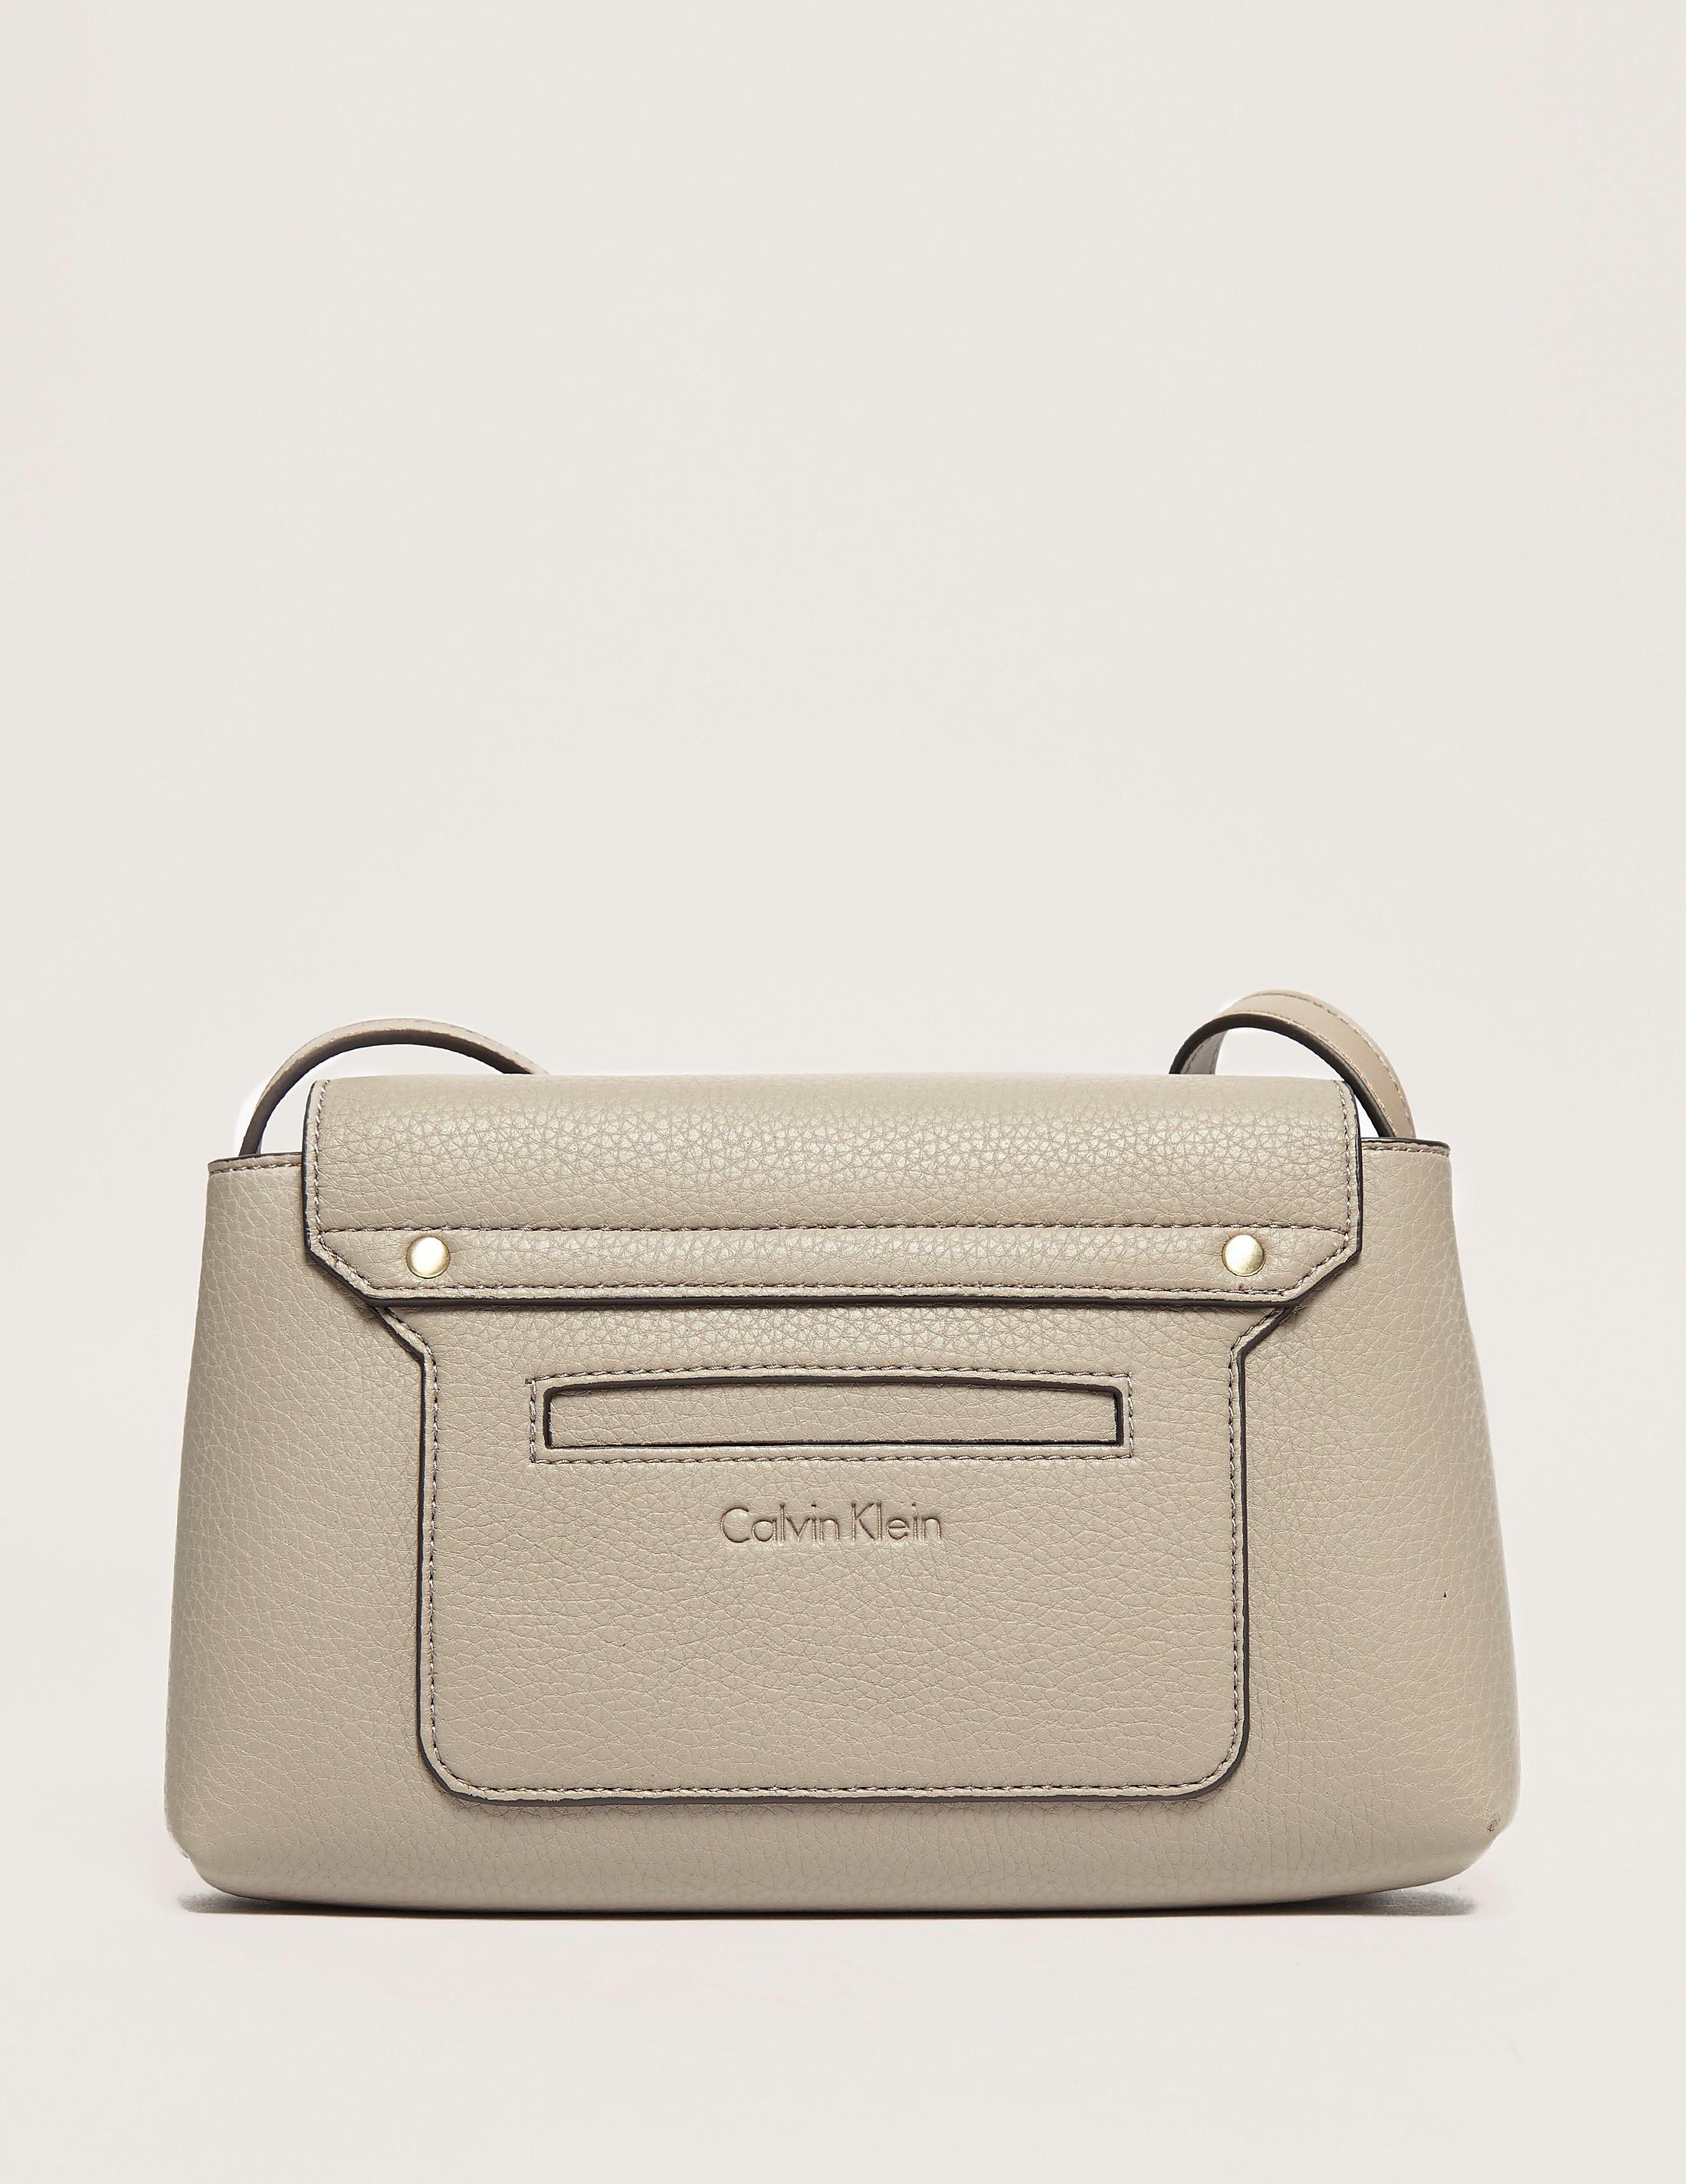 Calvin Klein Carrie Crossbody